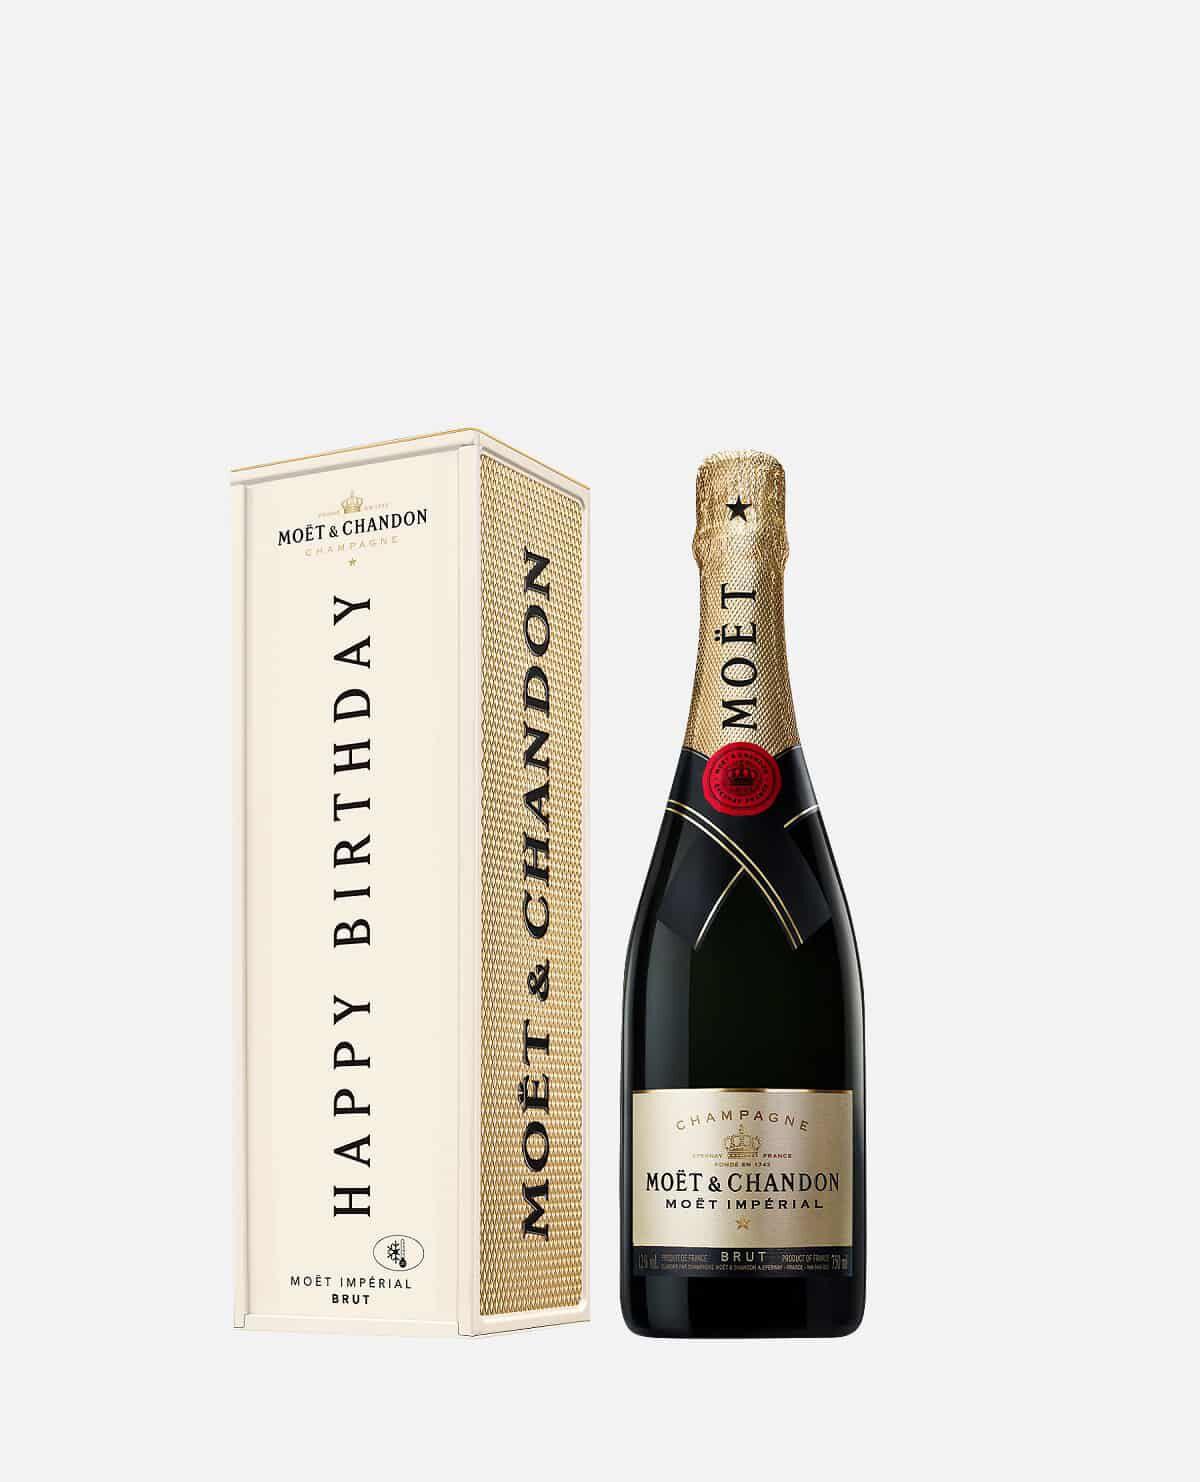 HAPPY BIRTHDAYモエ アンペリアル シャンパン